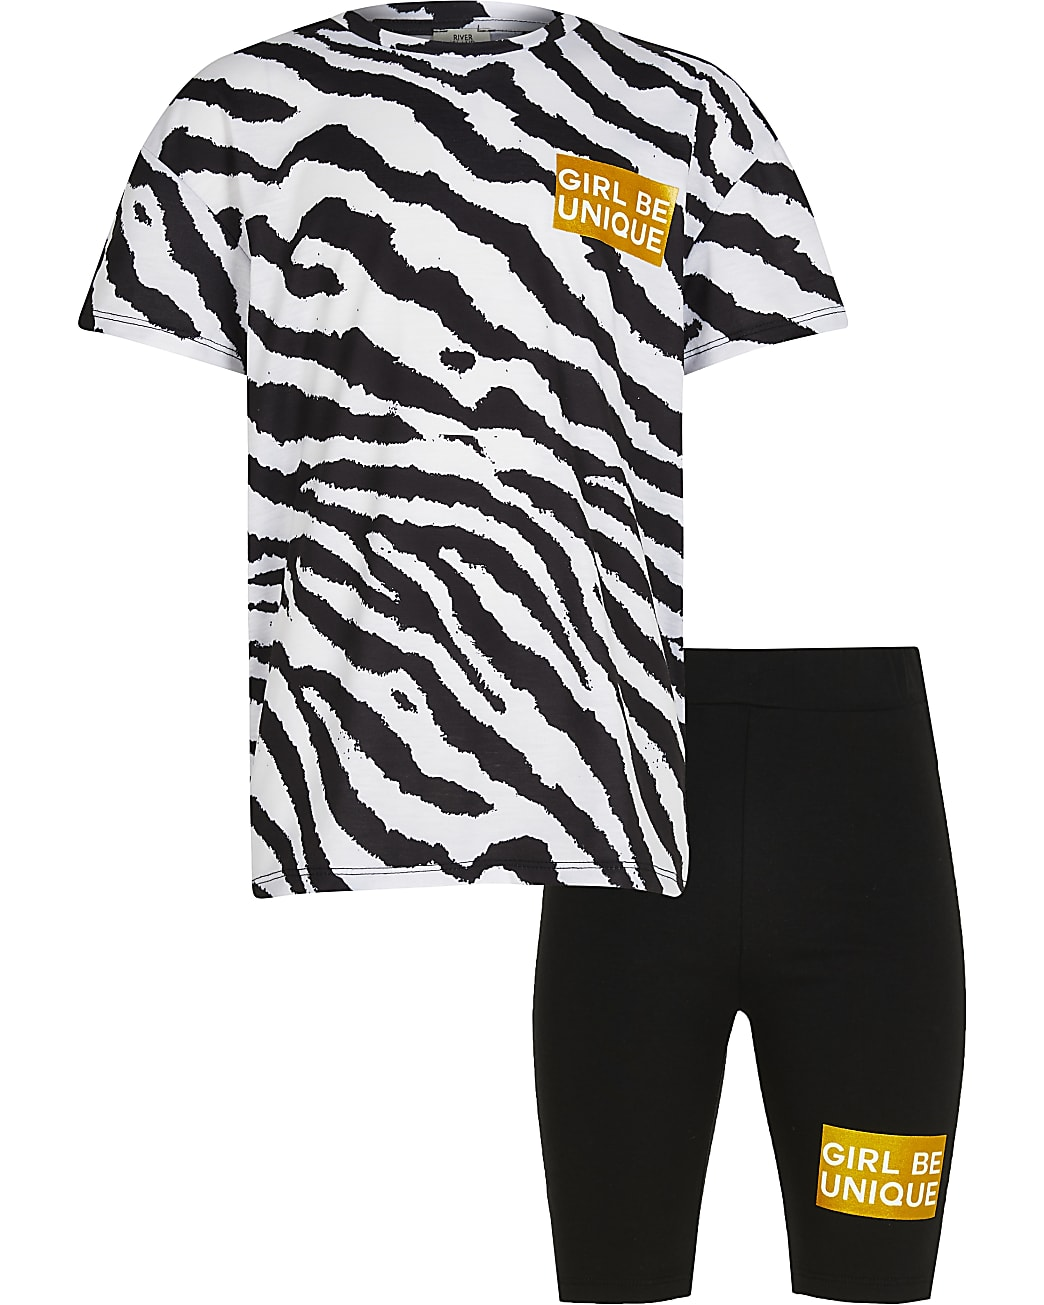 Age 13+ girls black animal print shorts set